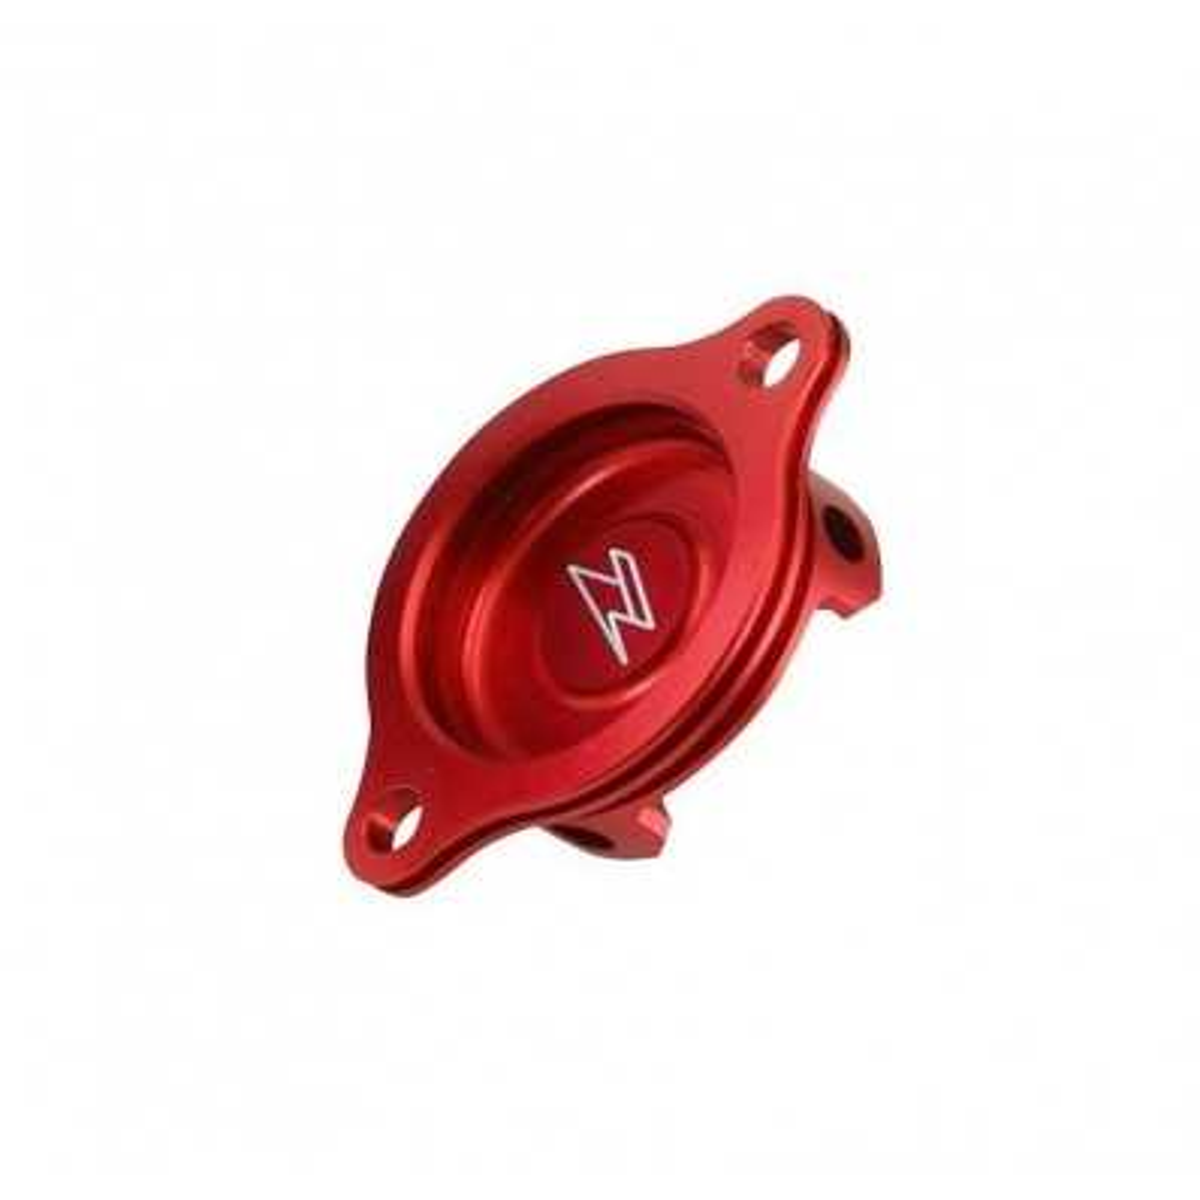 ZE90.1193 - Tapa Filtro Aceite Zeta Klx125´10-,D-Tracker125´10-, Klx150´09- Rojo